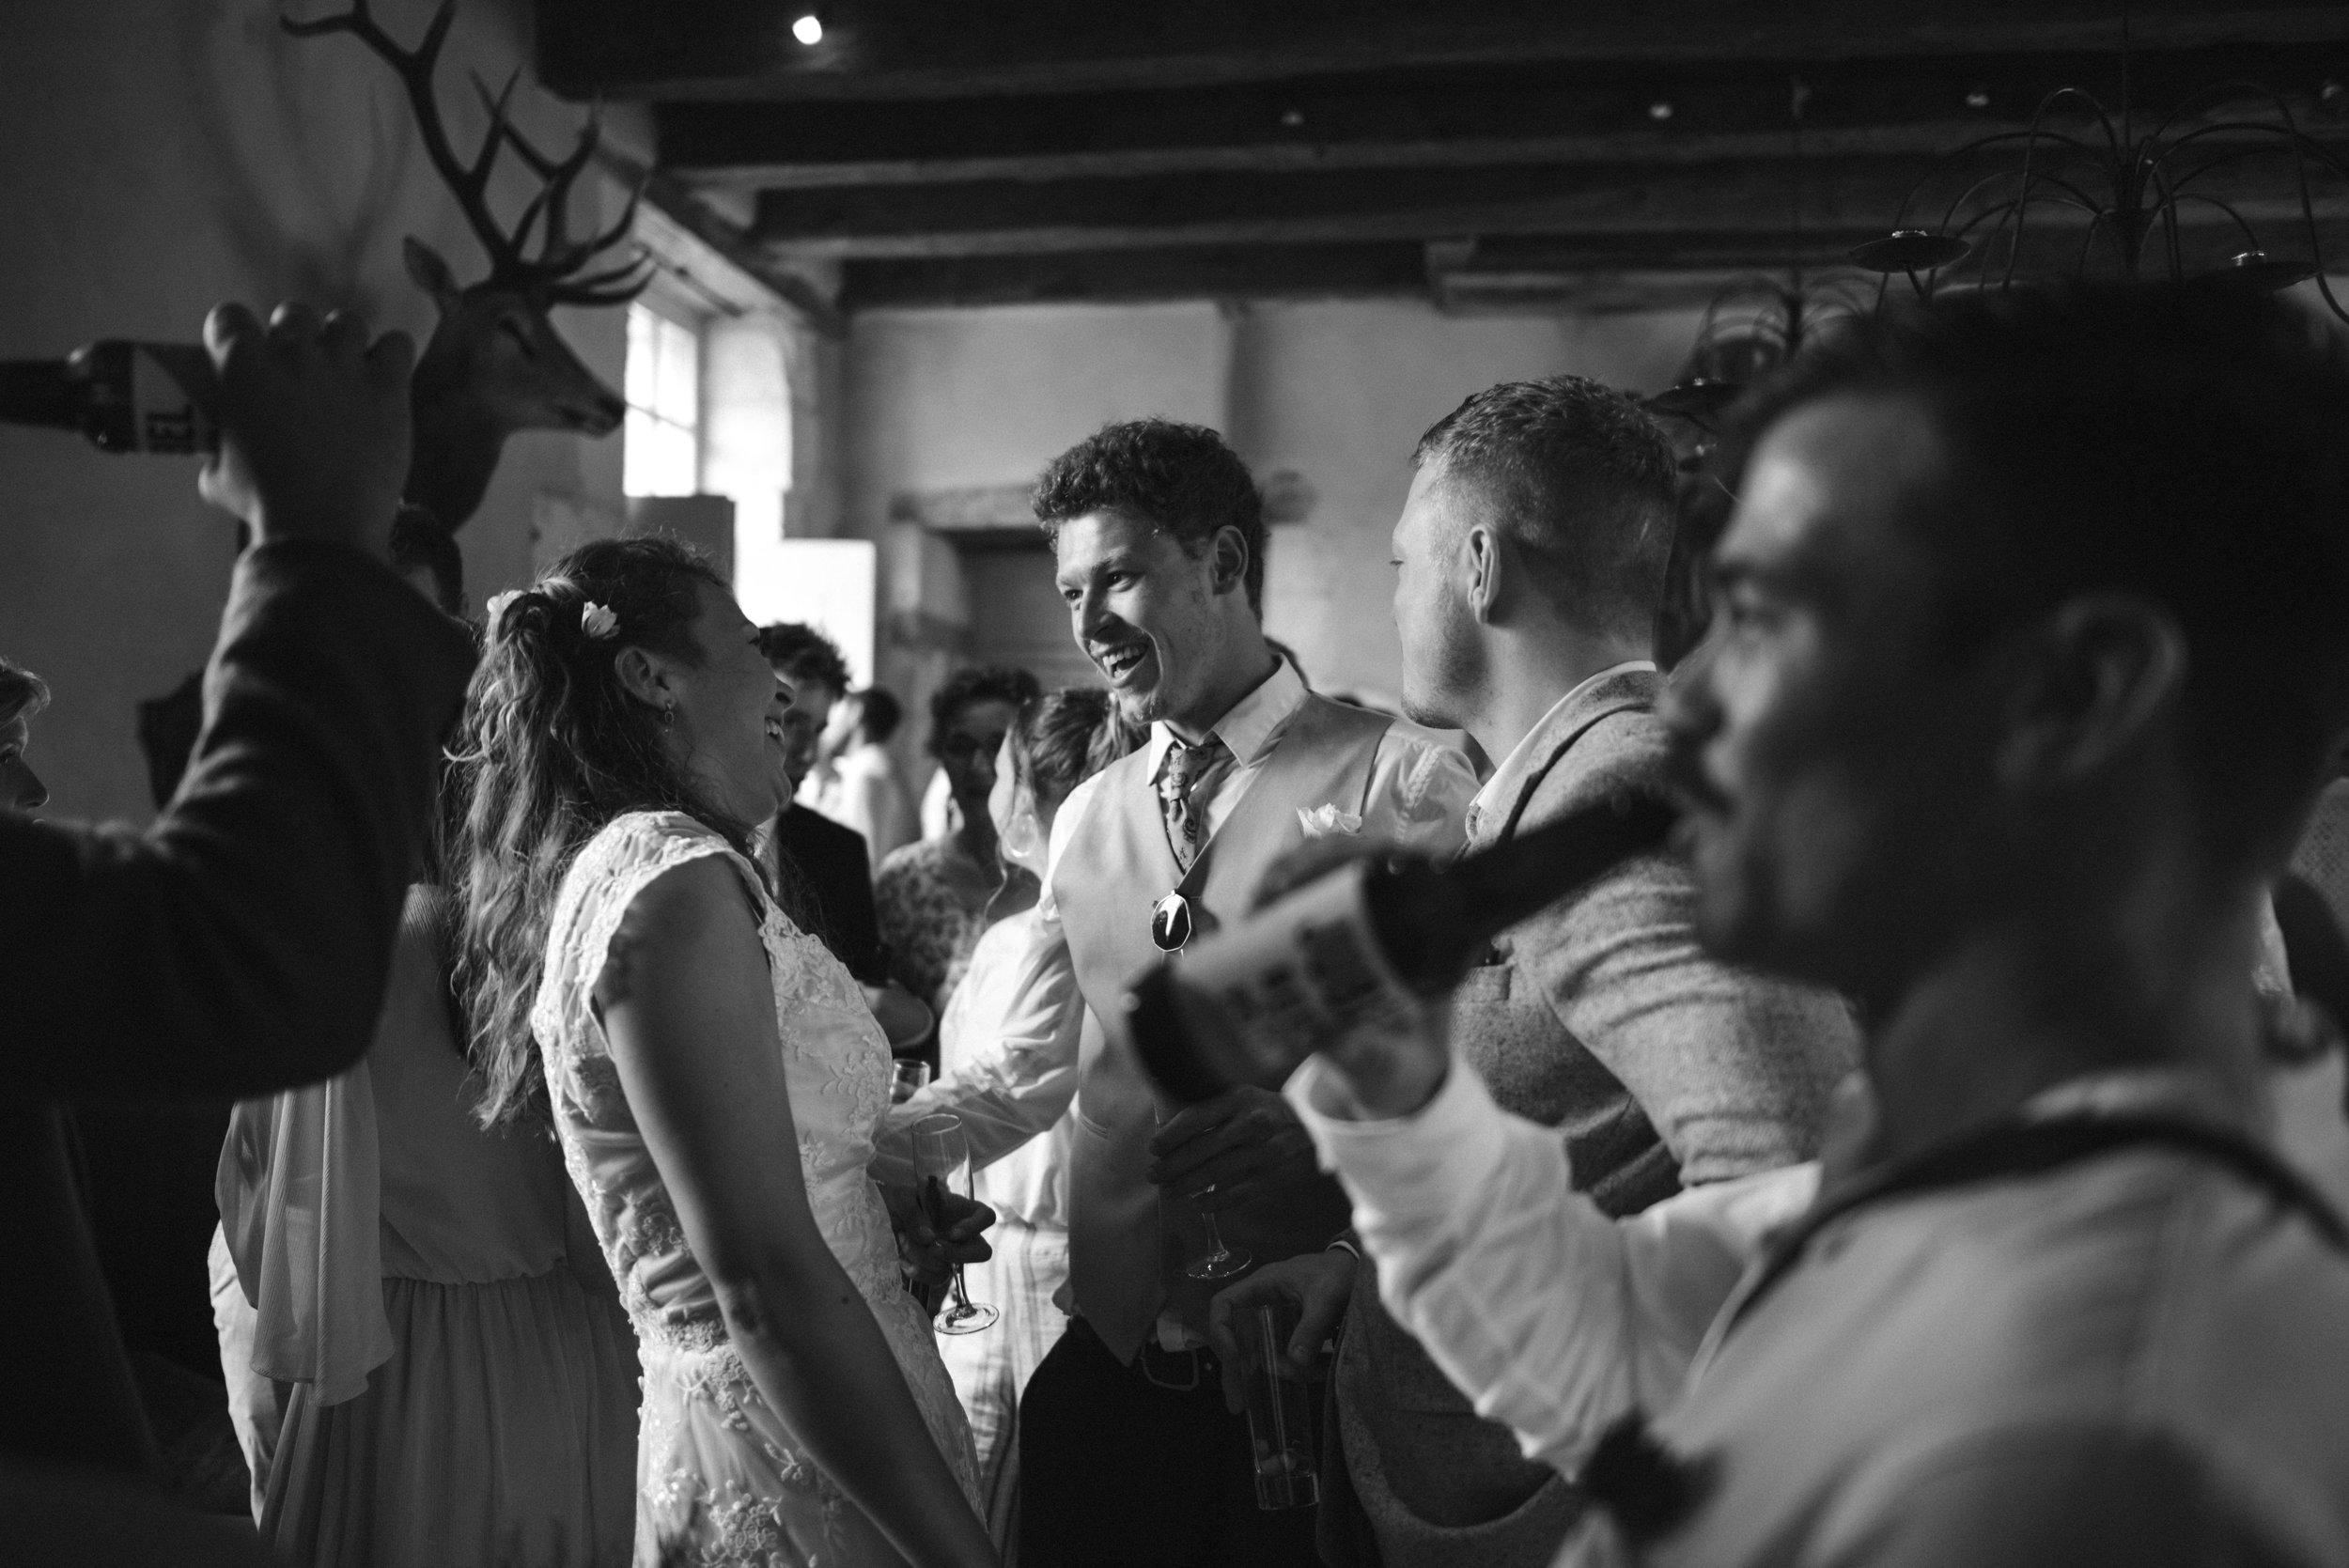 wedding-photographer-dordogne-mark-shaw-17.jpg